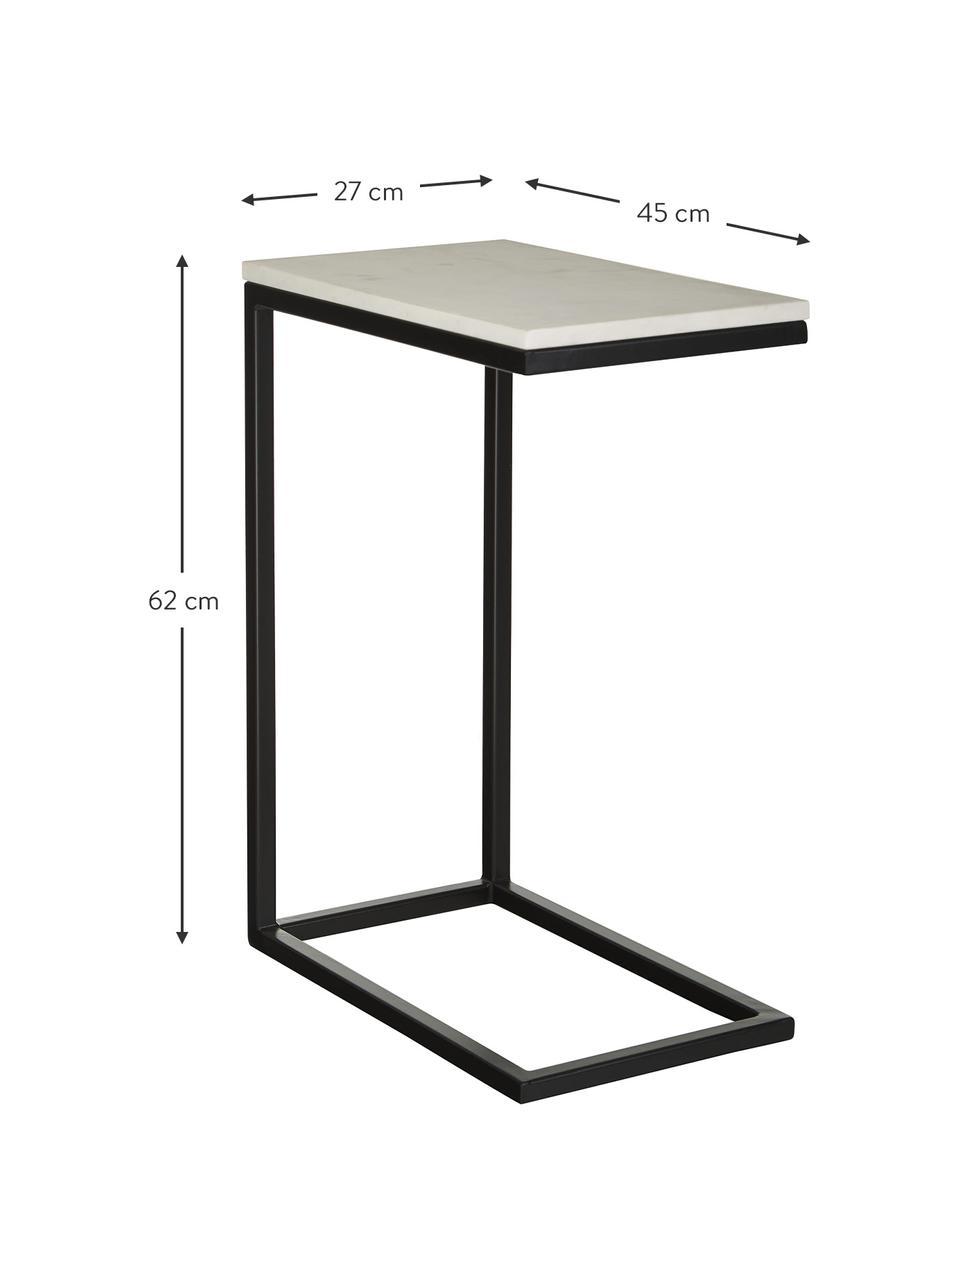 Table d'appoint en marbre Celow, Blanc